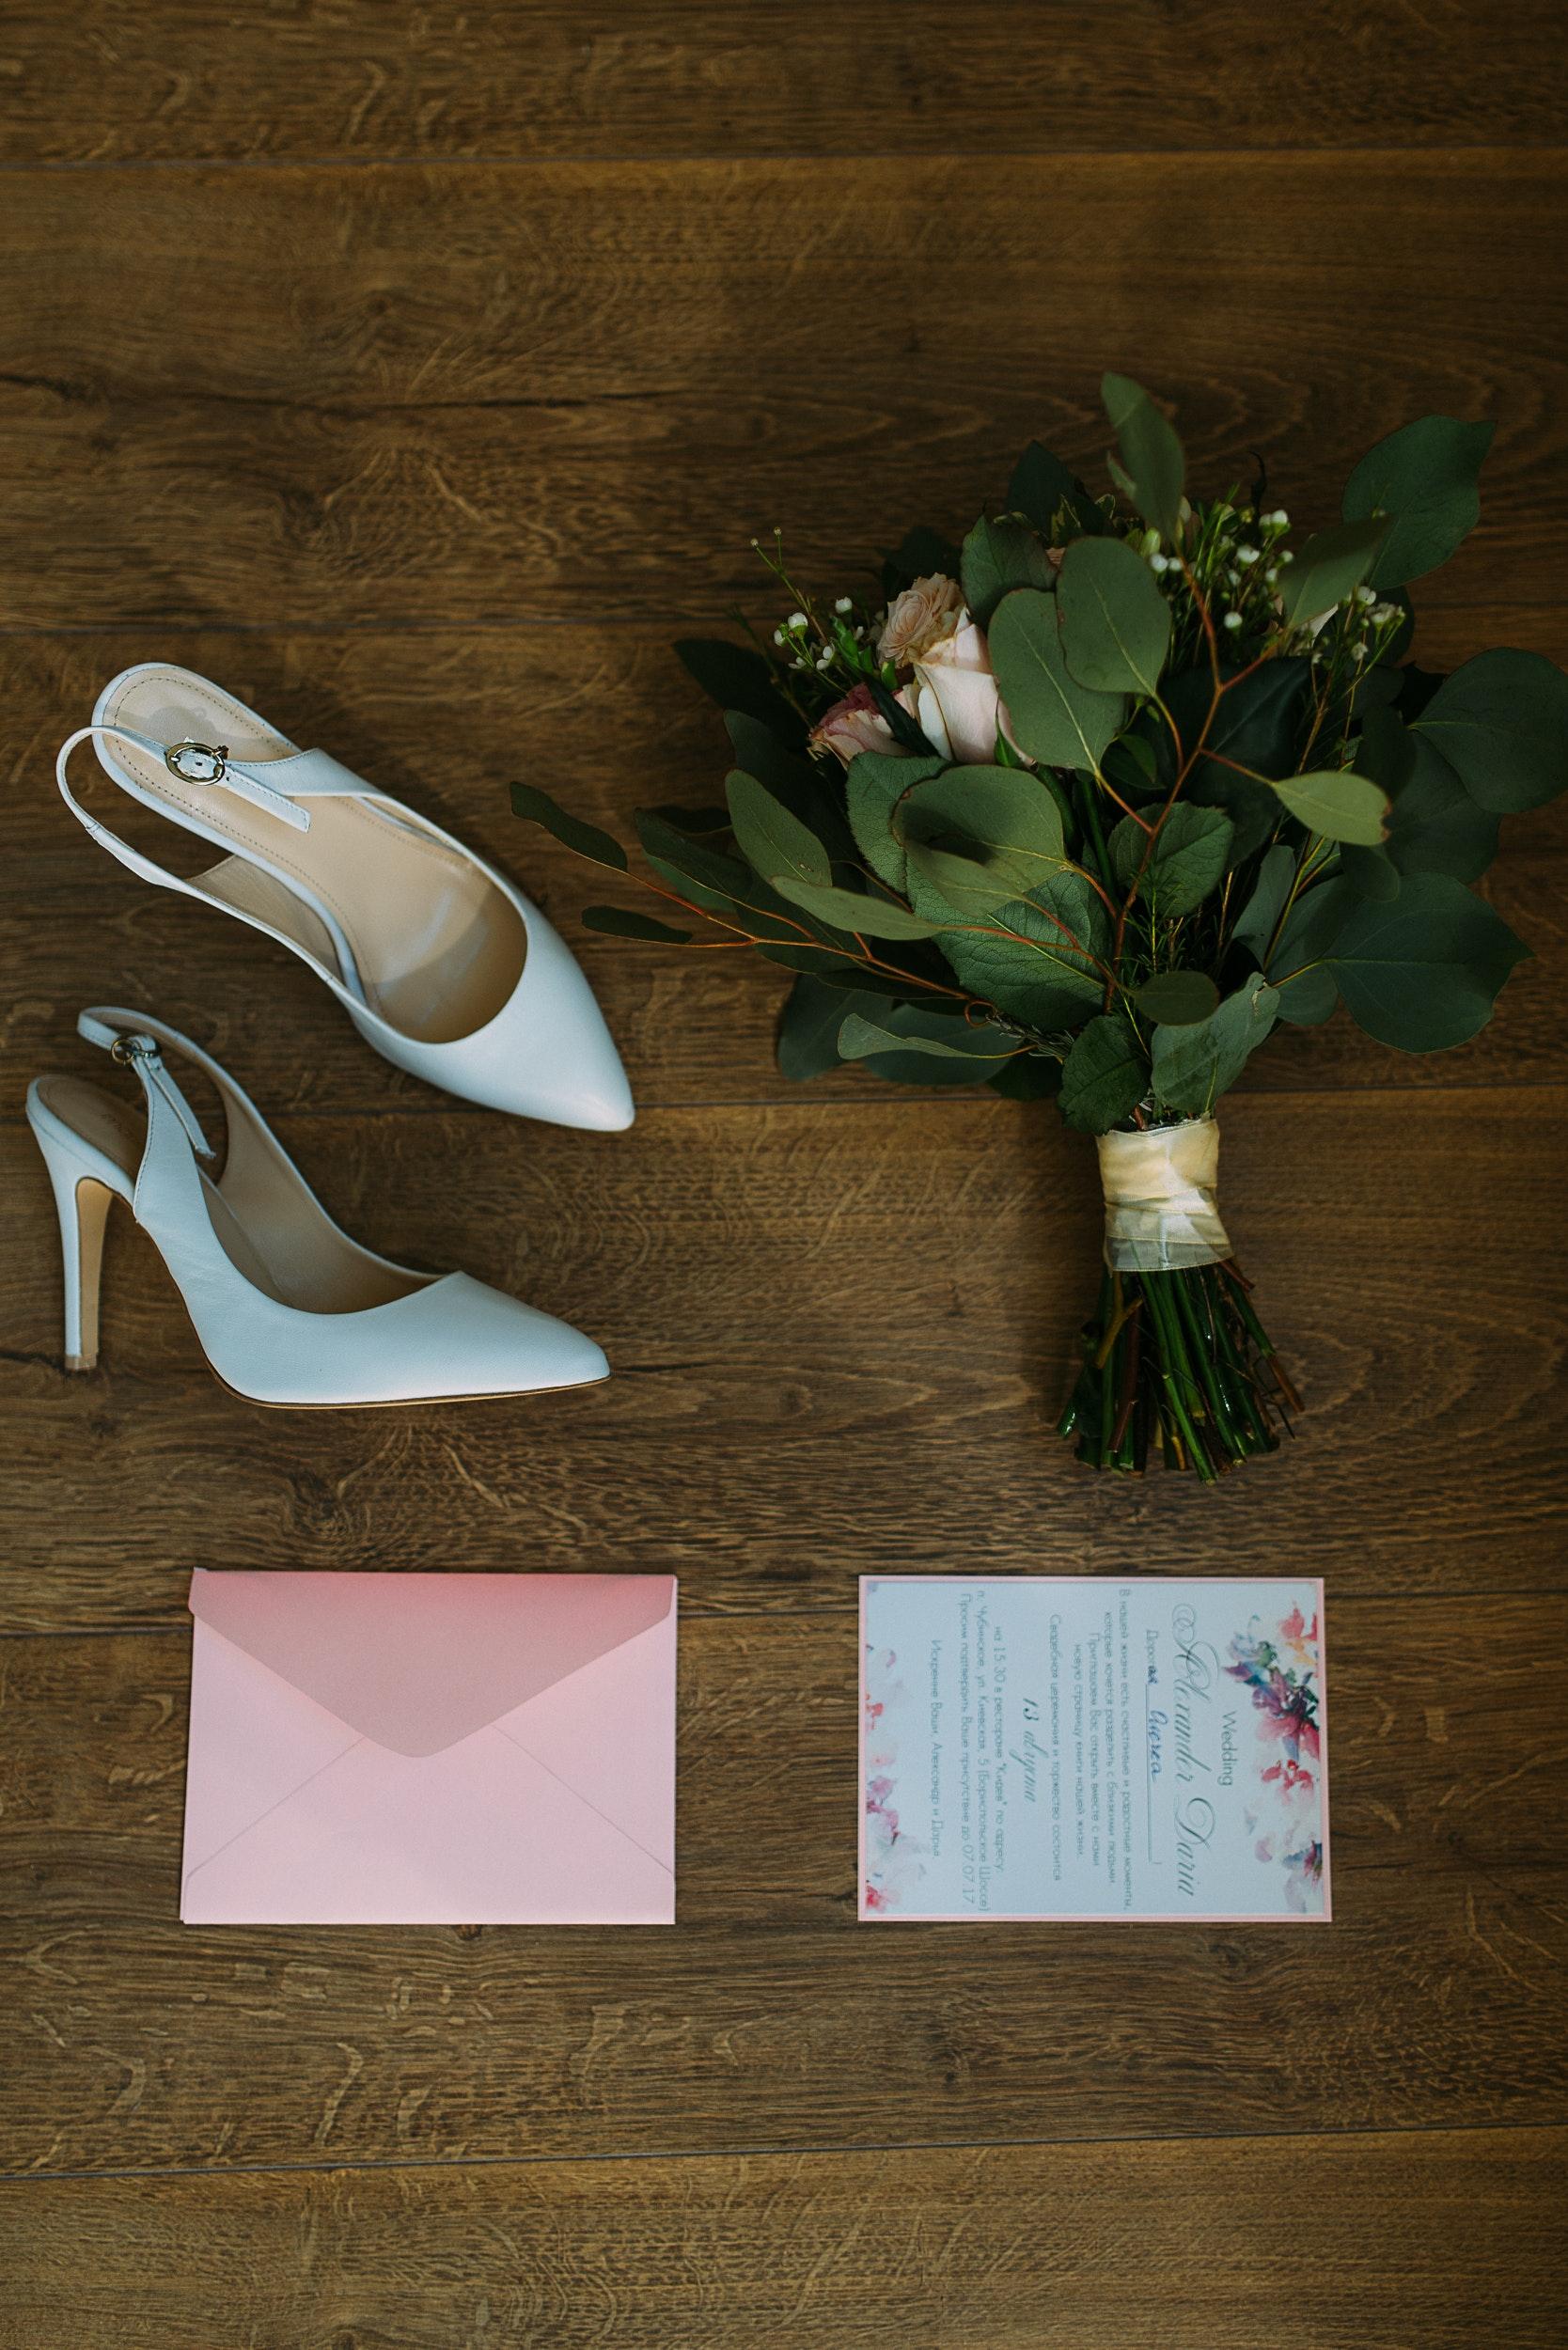 DIY Invitations: Top 3 Ideas To Create Your Wedding Invitations